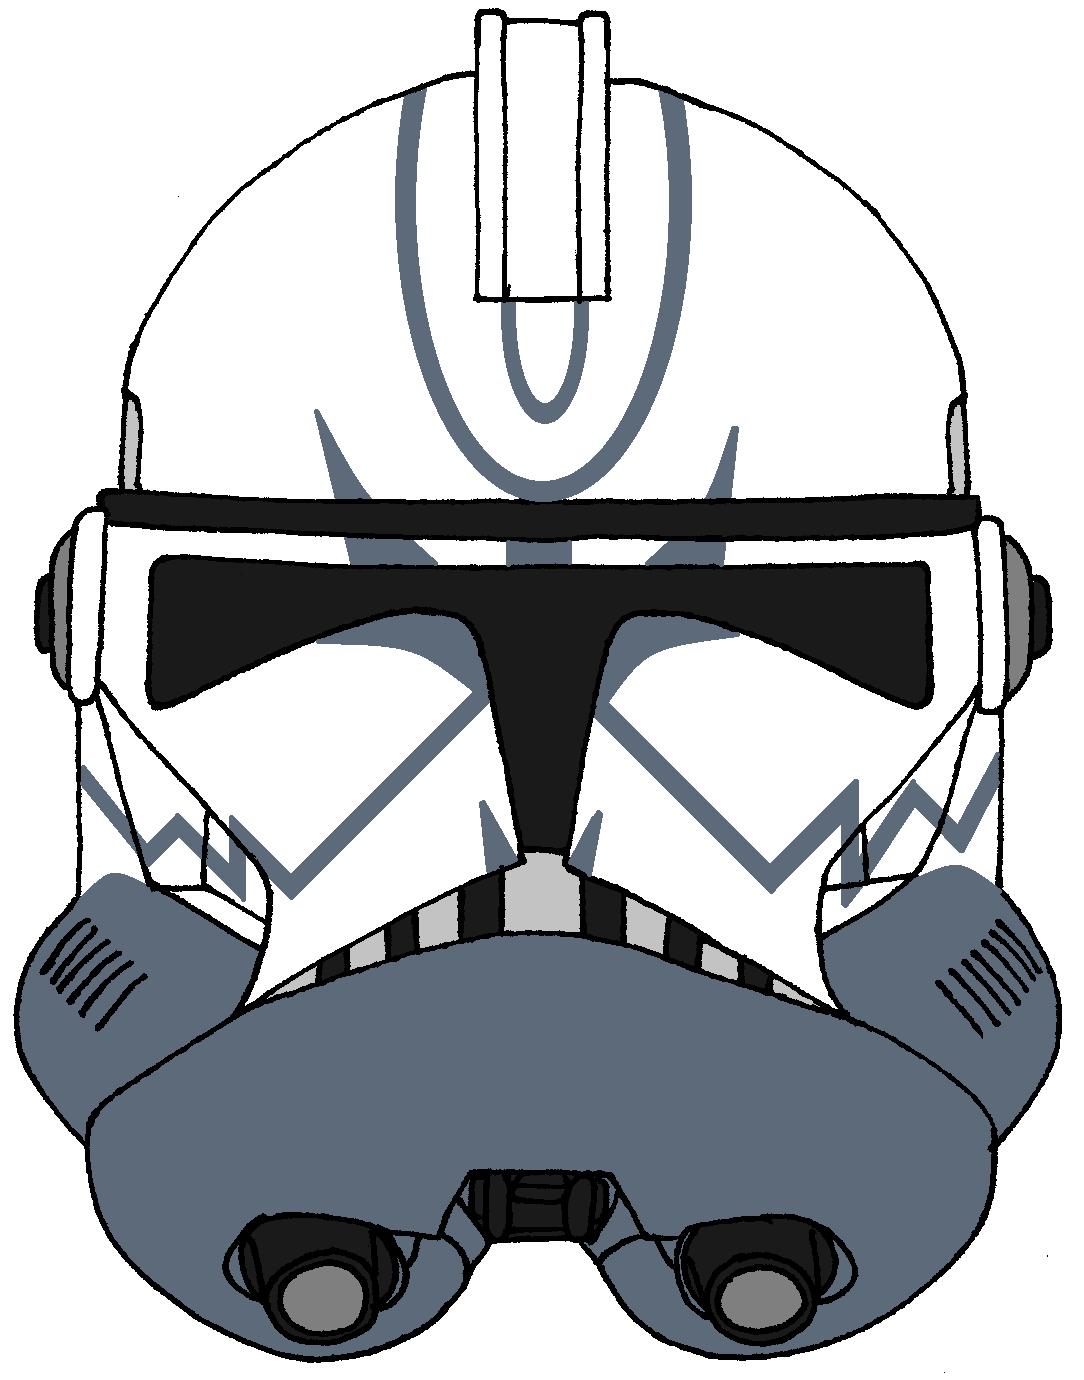 Clone Trooper Comet S Helmet 2 Star Wars Helmet Star Wars Characters Star Wars Trooper